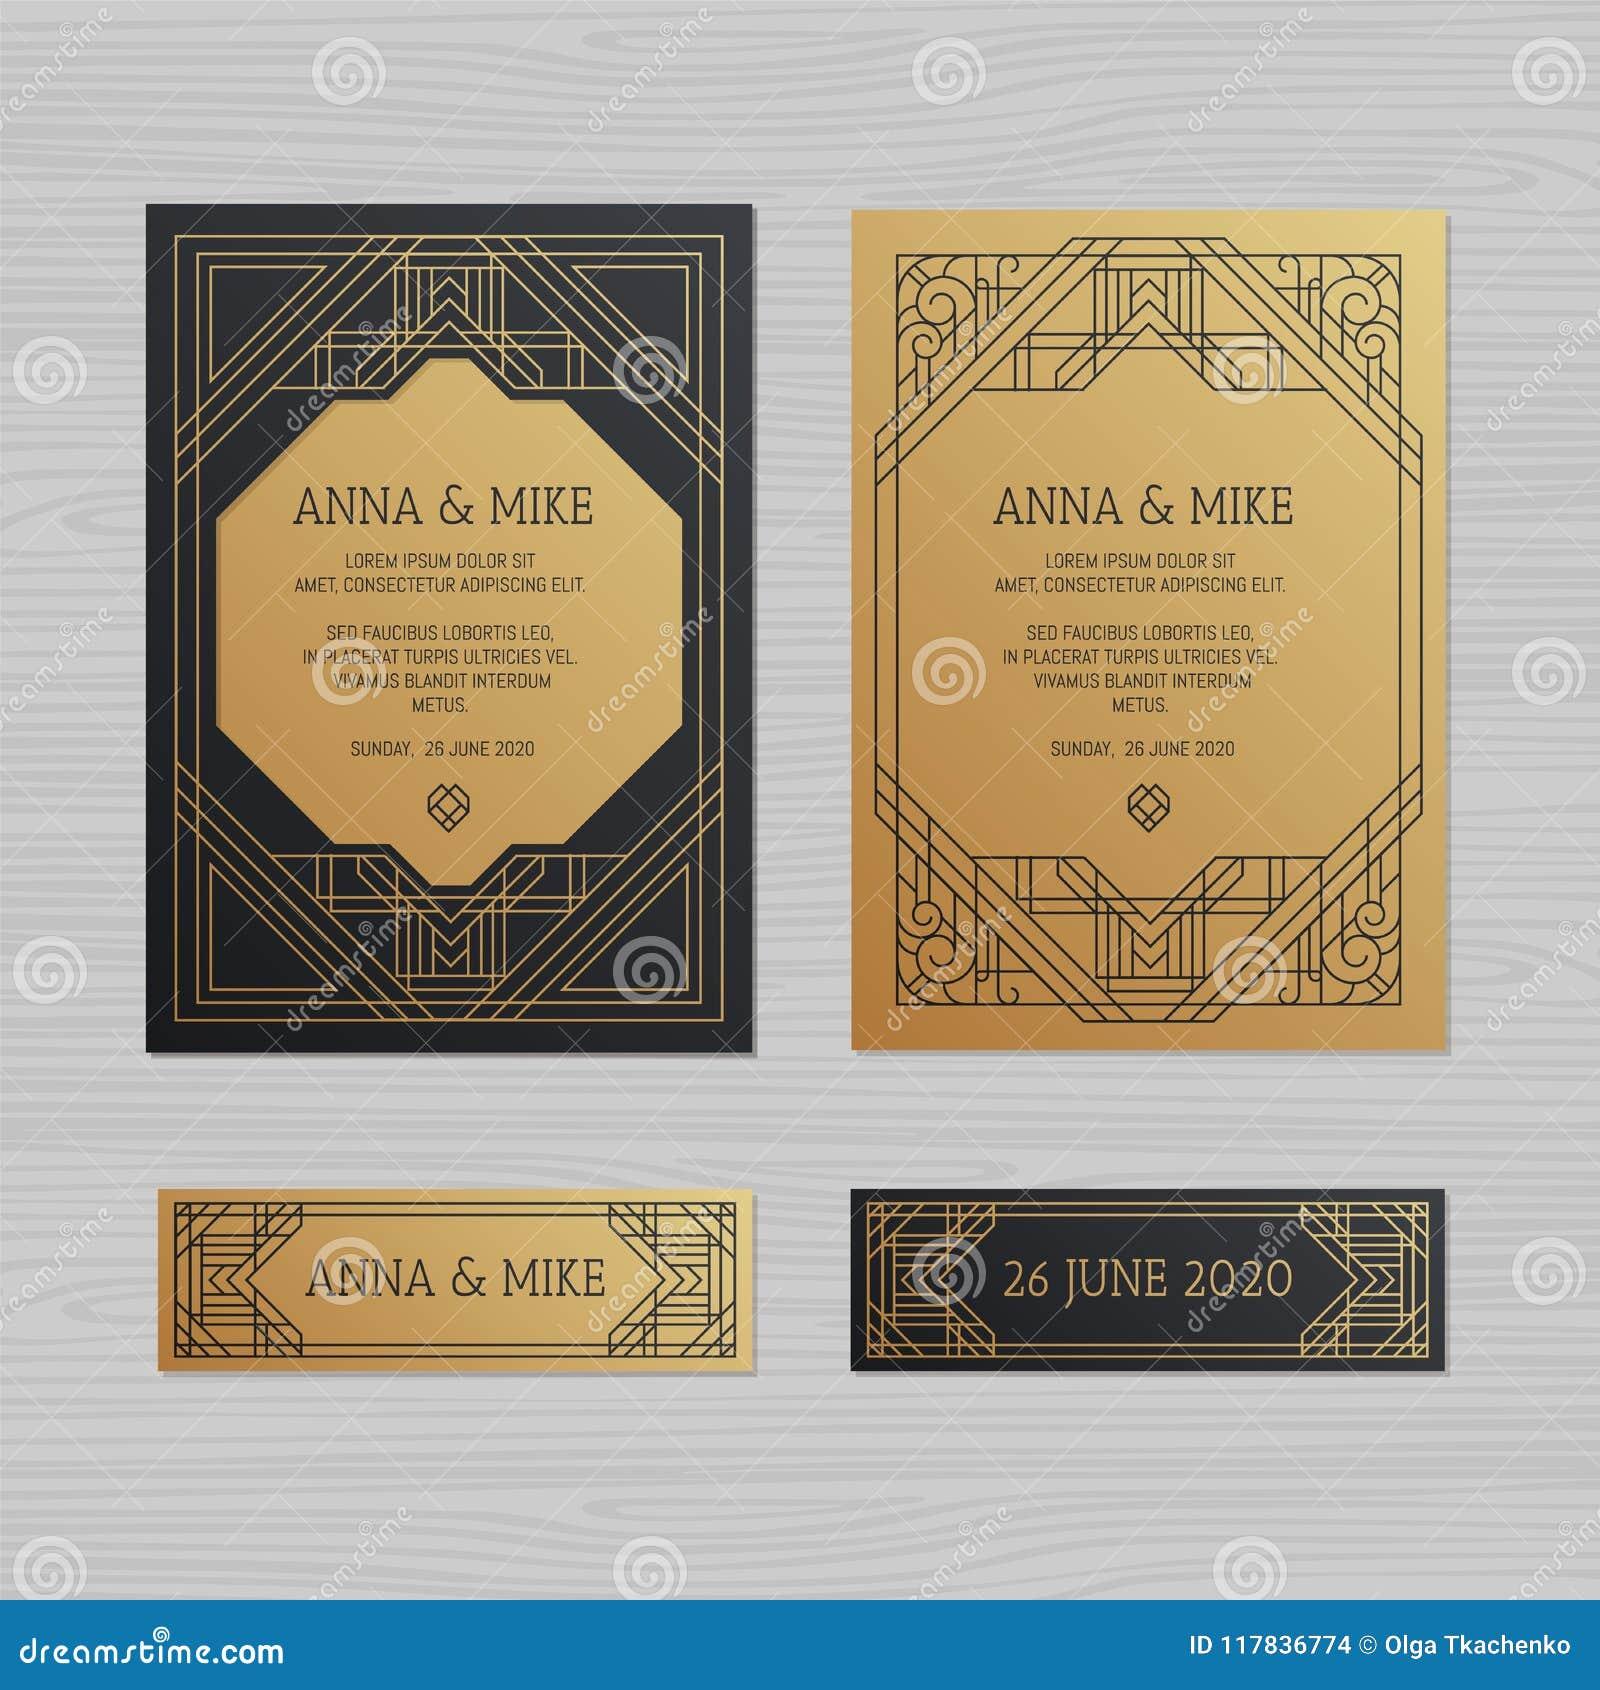 luxury wedding invitation or greeting card with geometric ornament